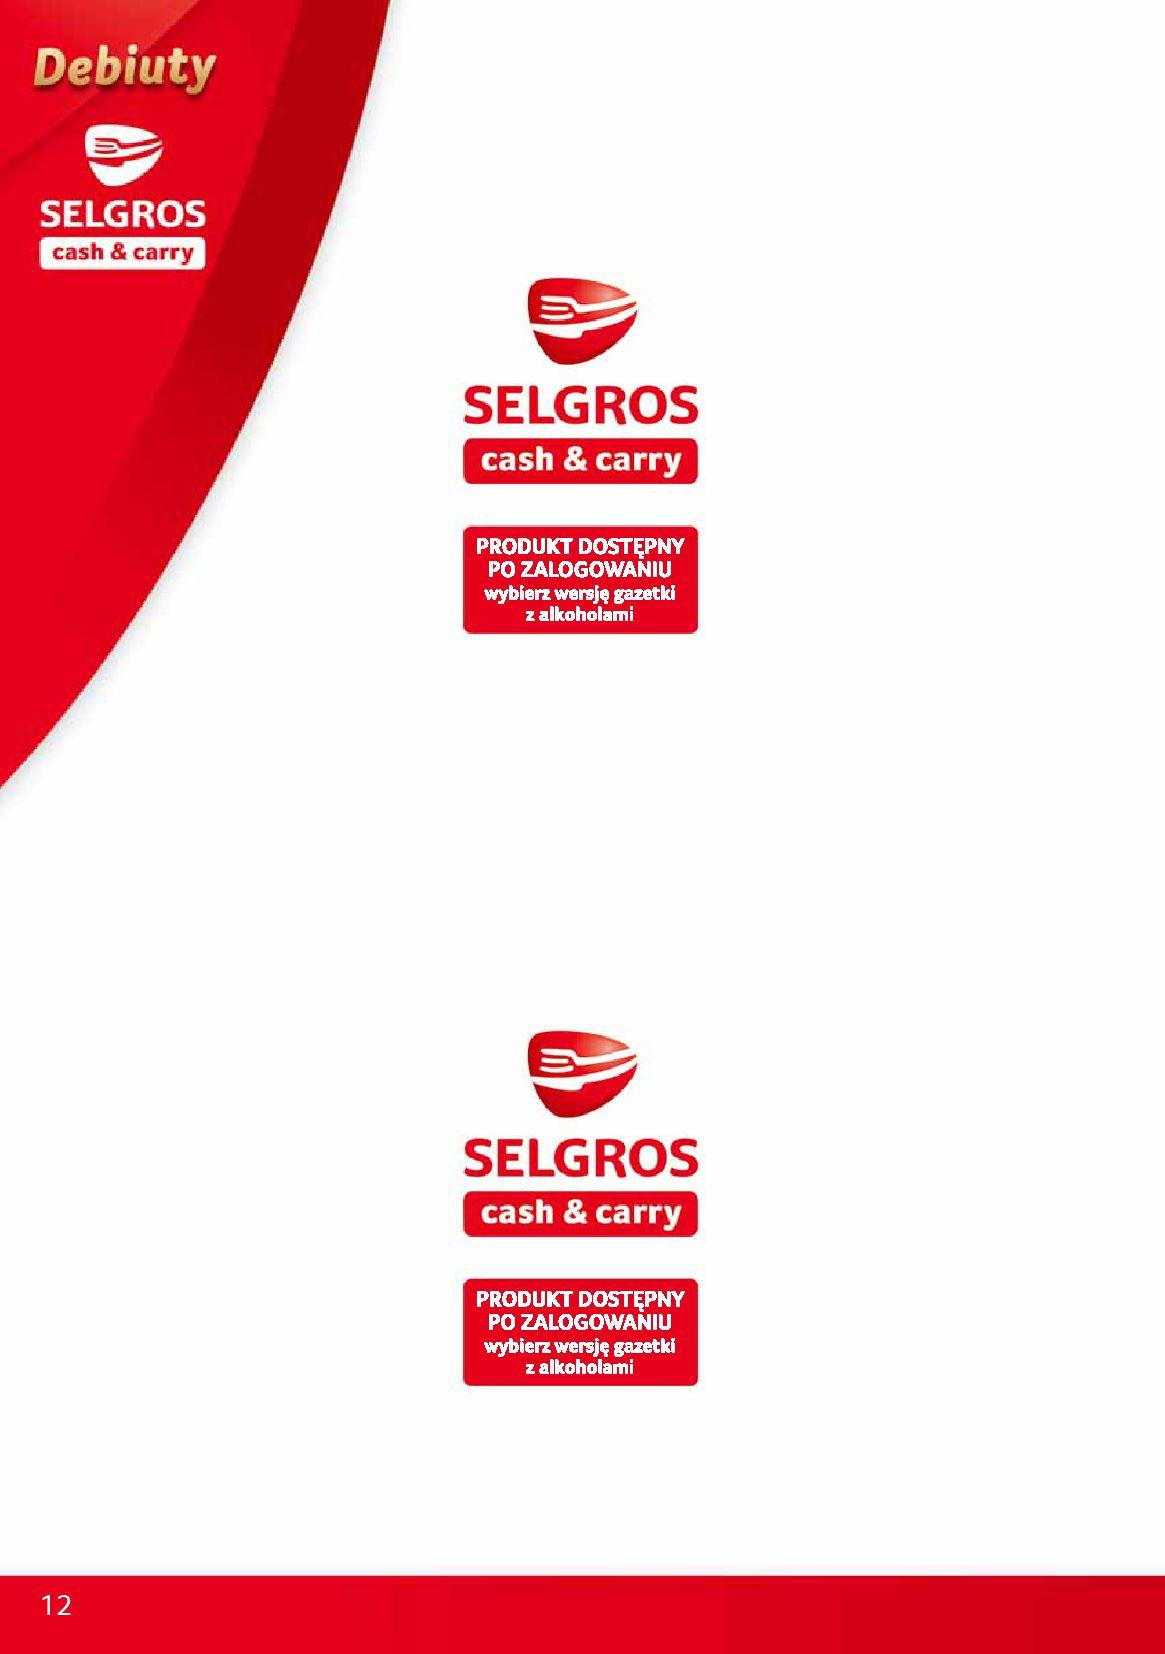 Gazetka Selgros - Debiuty w Selgros-09.10.2019-23.10.2019-page-12